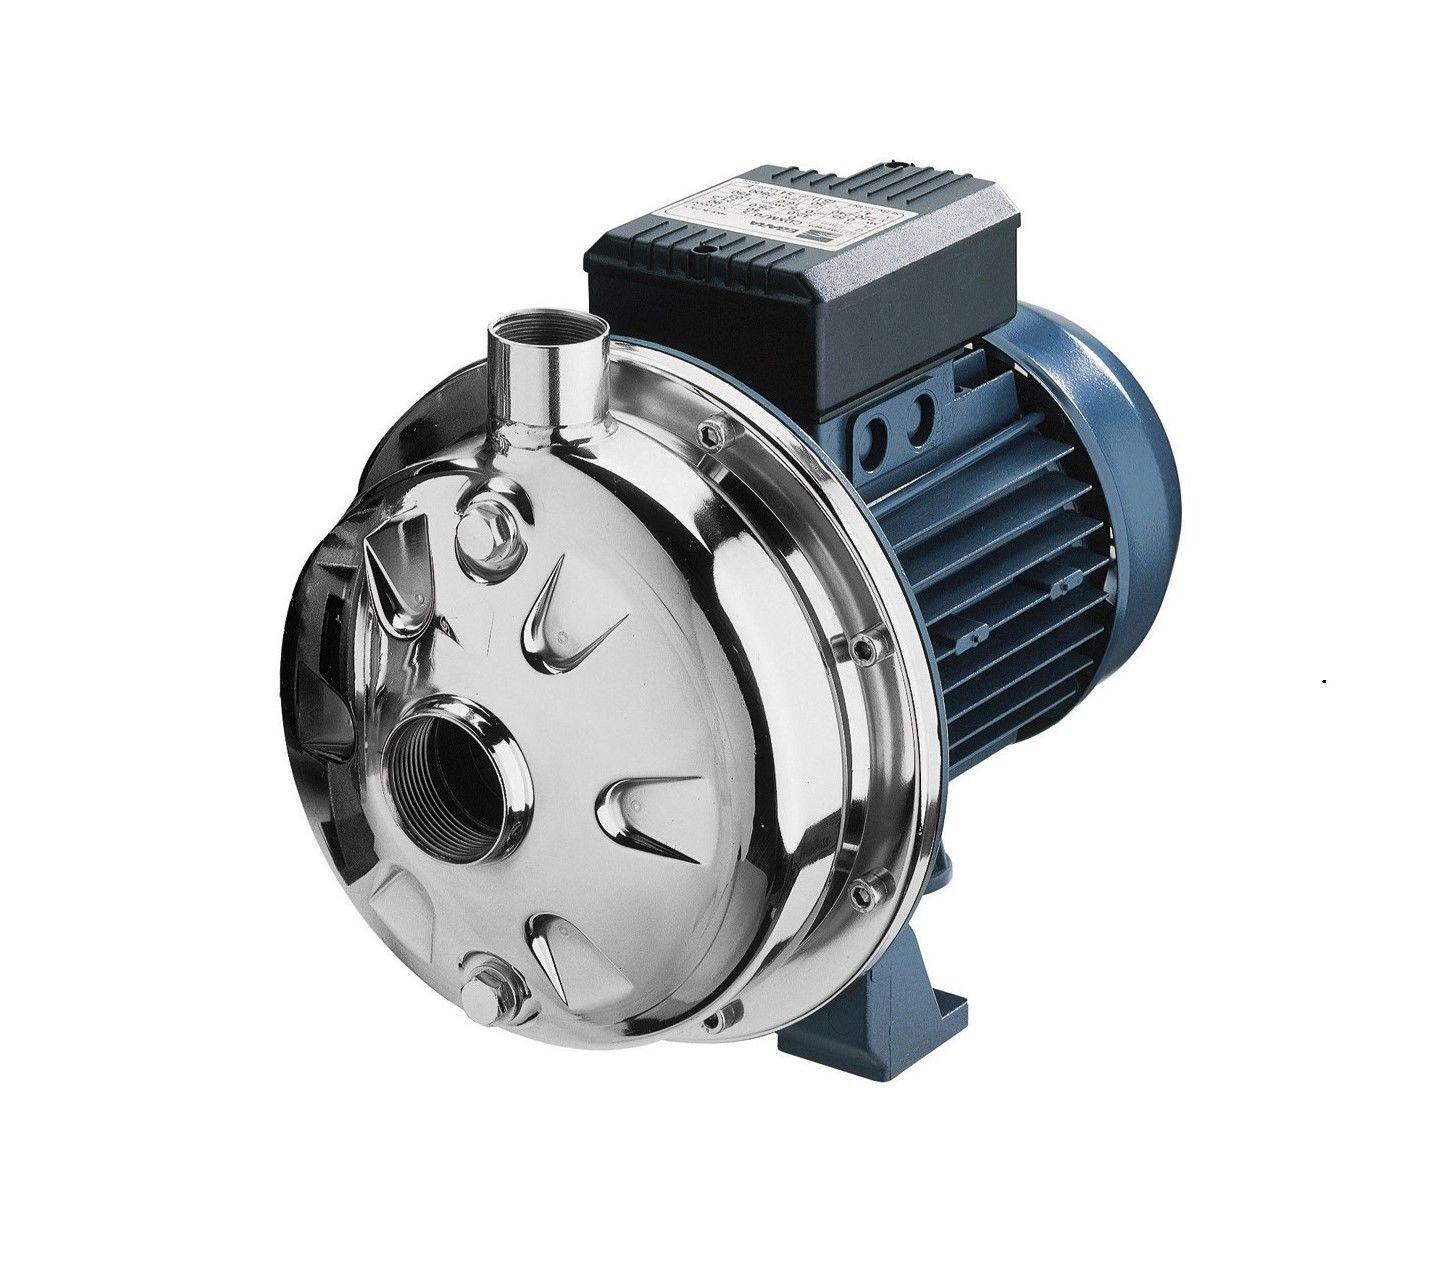 Центробежный насос Ebara CDX/I 120/12 0.90 кВт